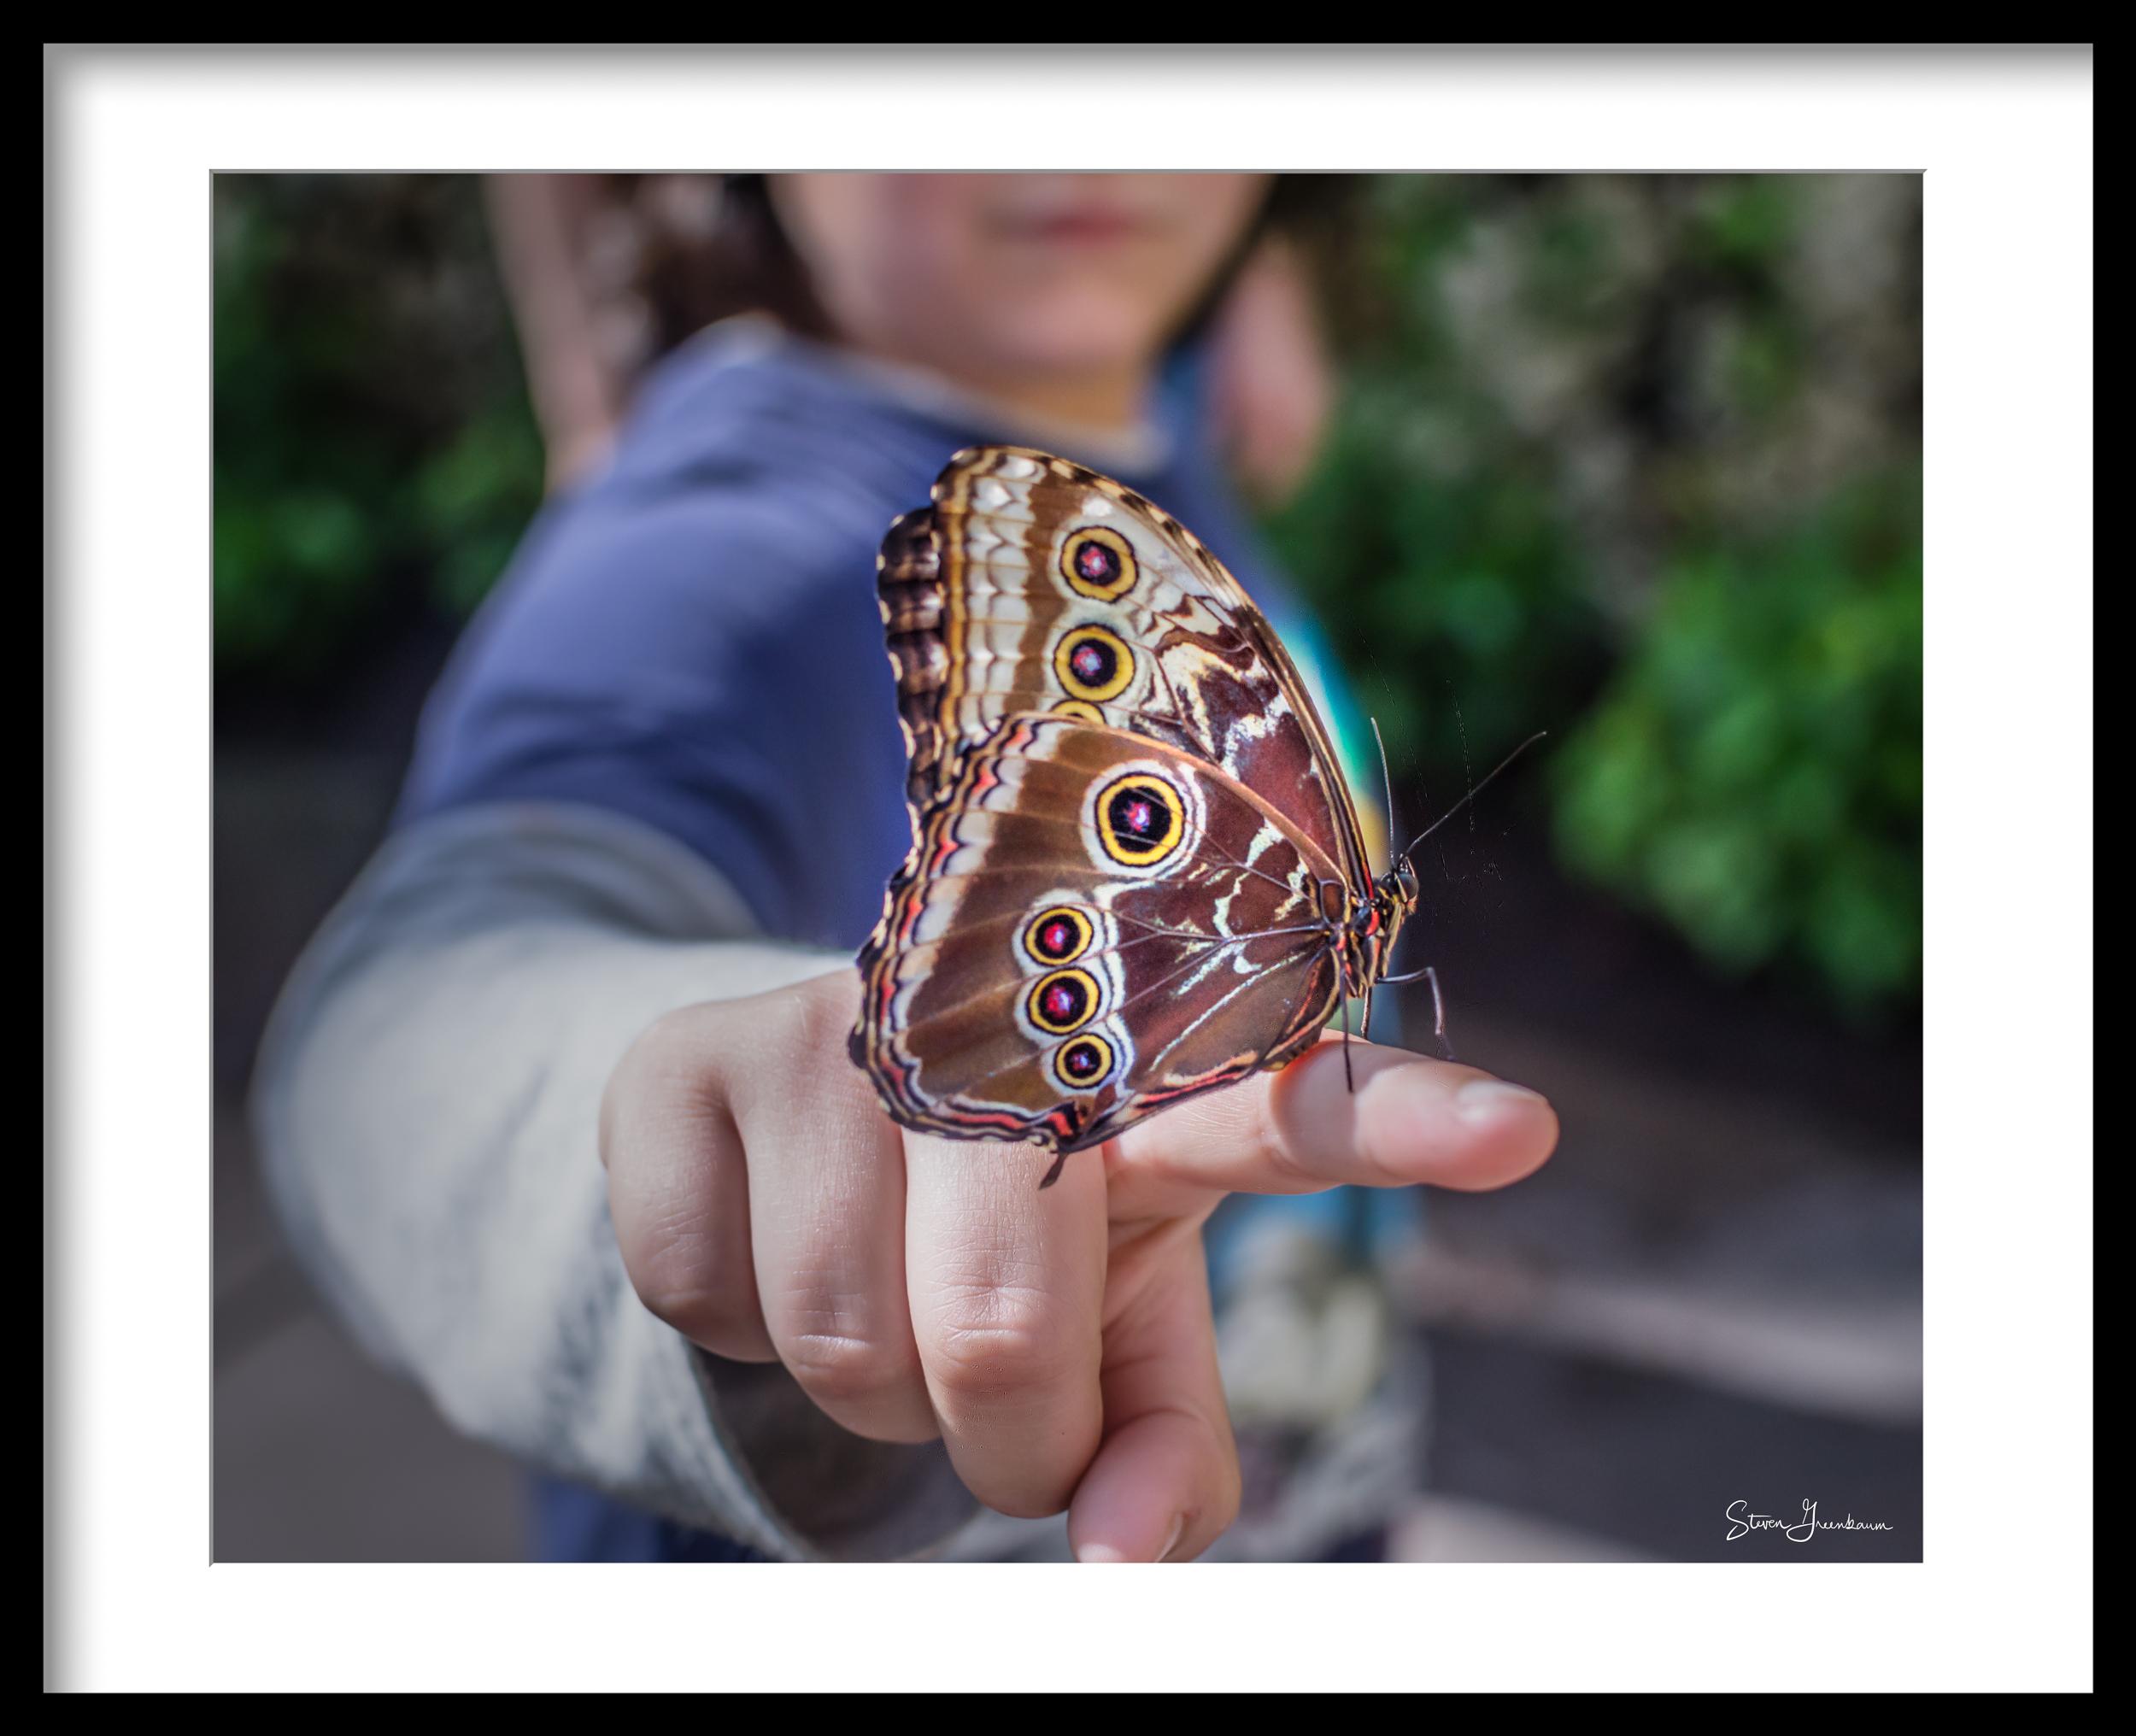 Blue Morpho Butterfly, Fairchild 2013  https://www.rainforest-alliance.org/species/blue-butterfly